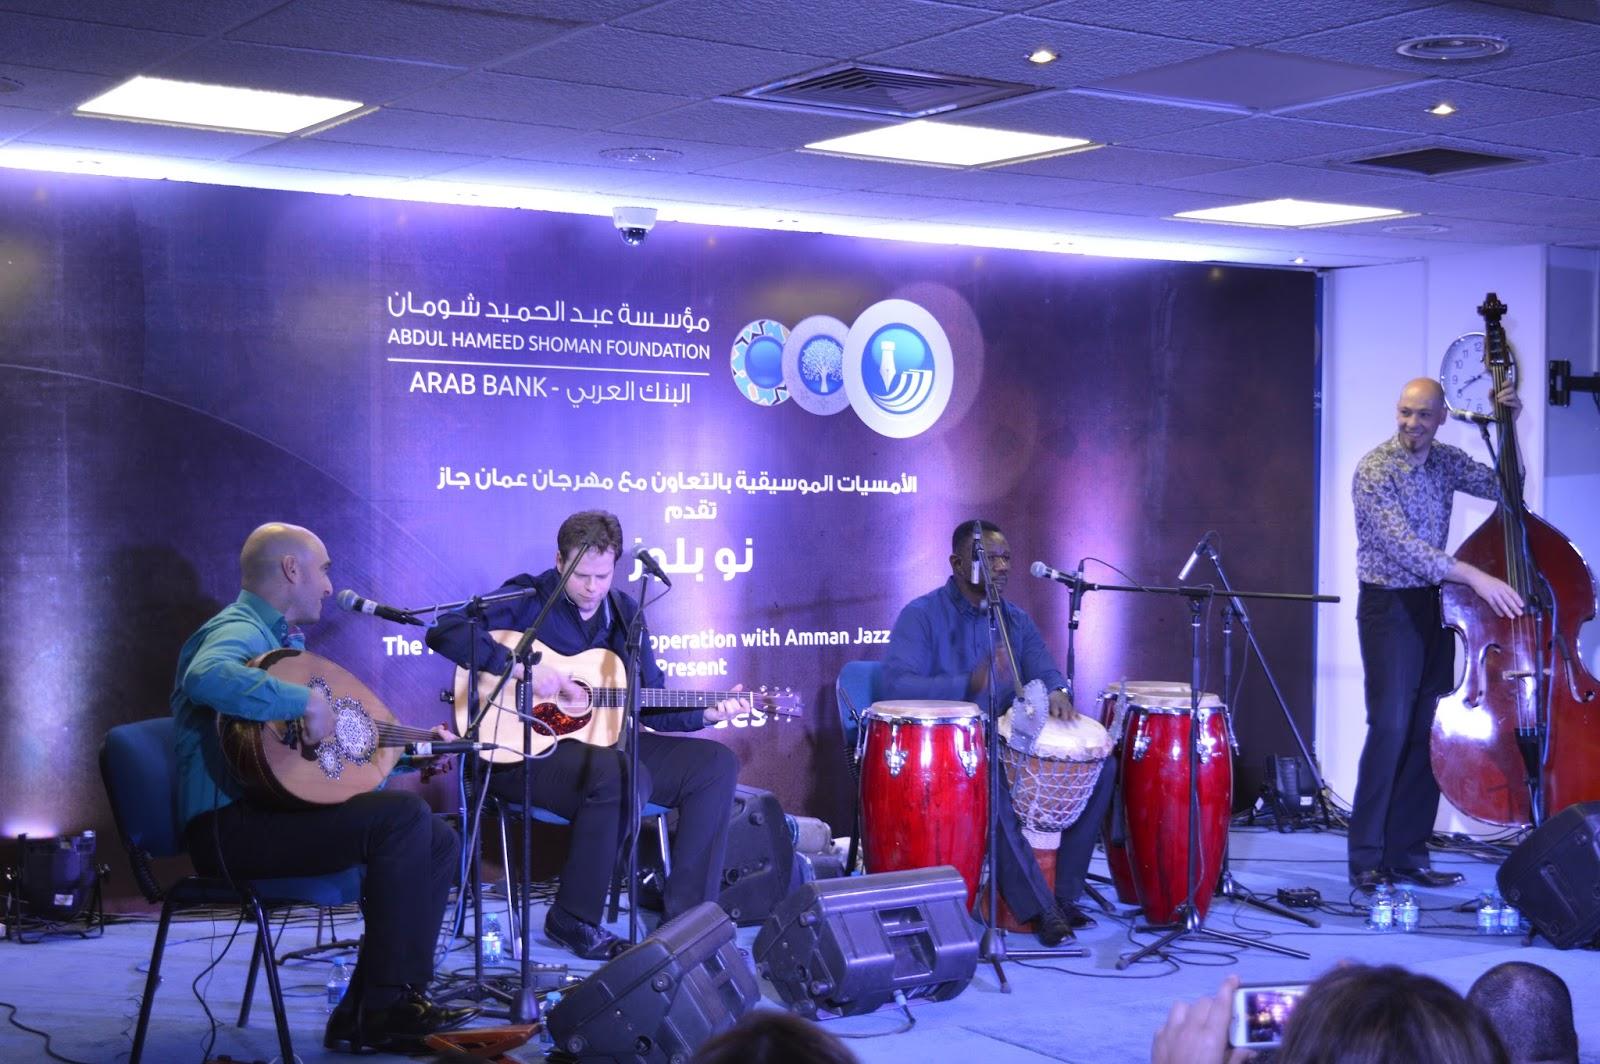 9d5cbef7a ... وملتقى لموسيقى البلوز الشعبية مع الموسيقى العربية، بدأت فرقة